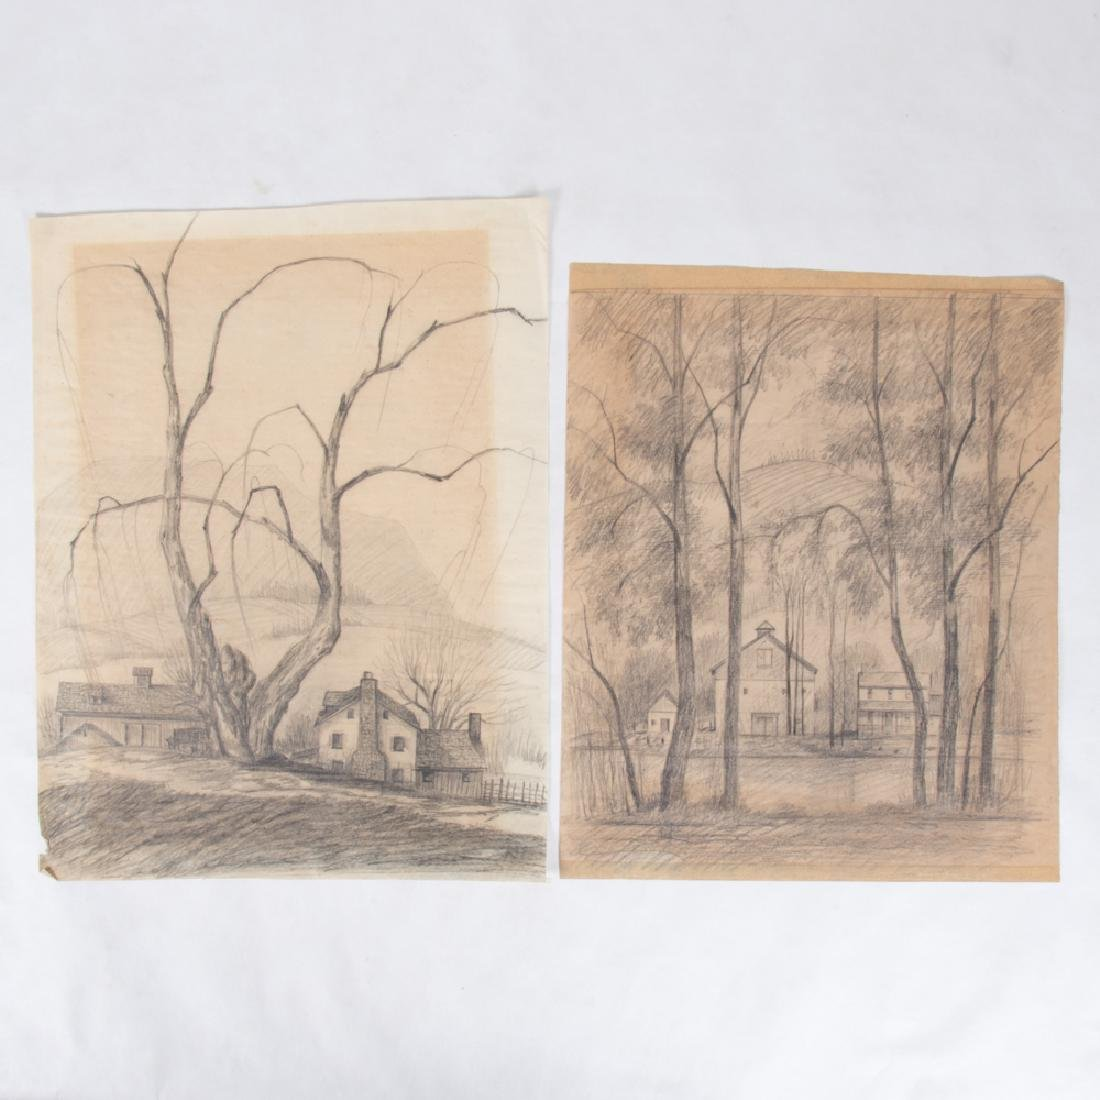 Paul Riba (1912-1977) Two Landscape Studies, Pencil on